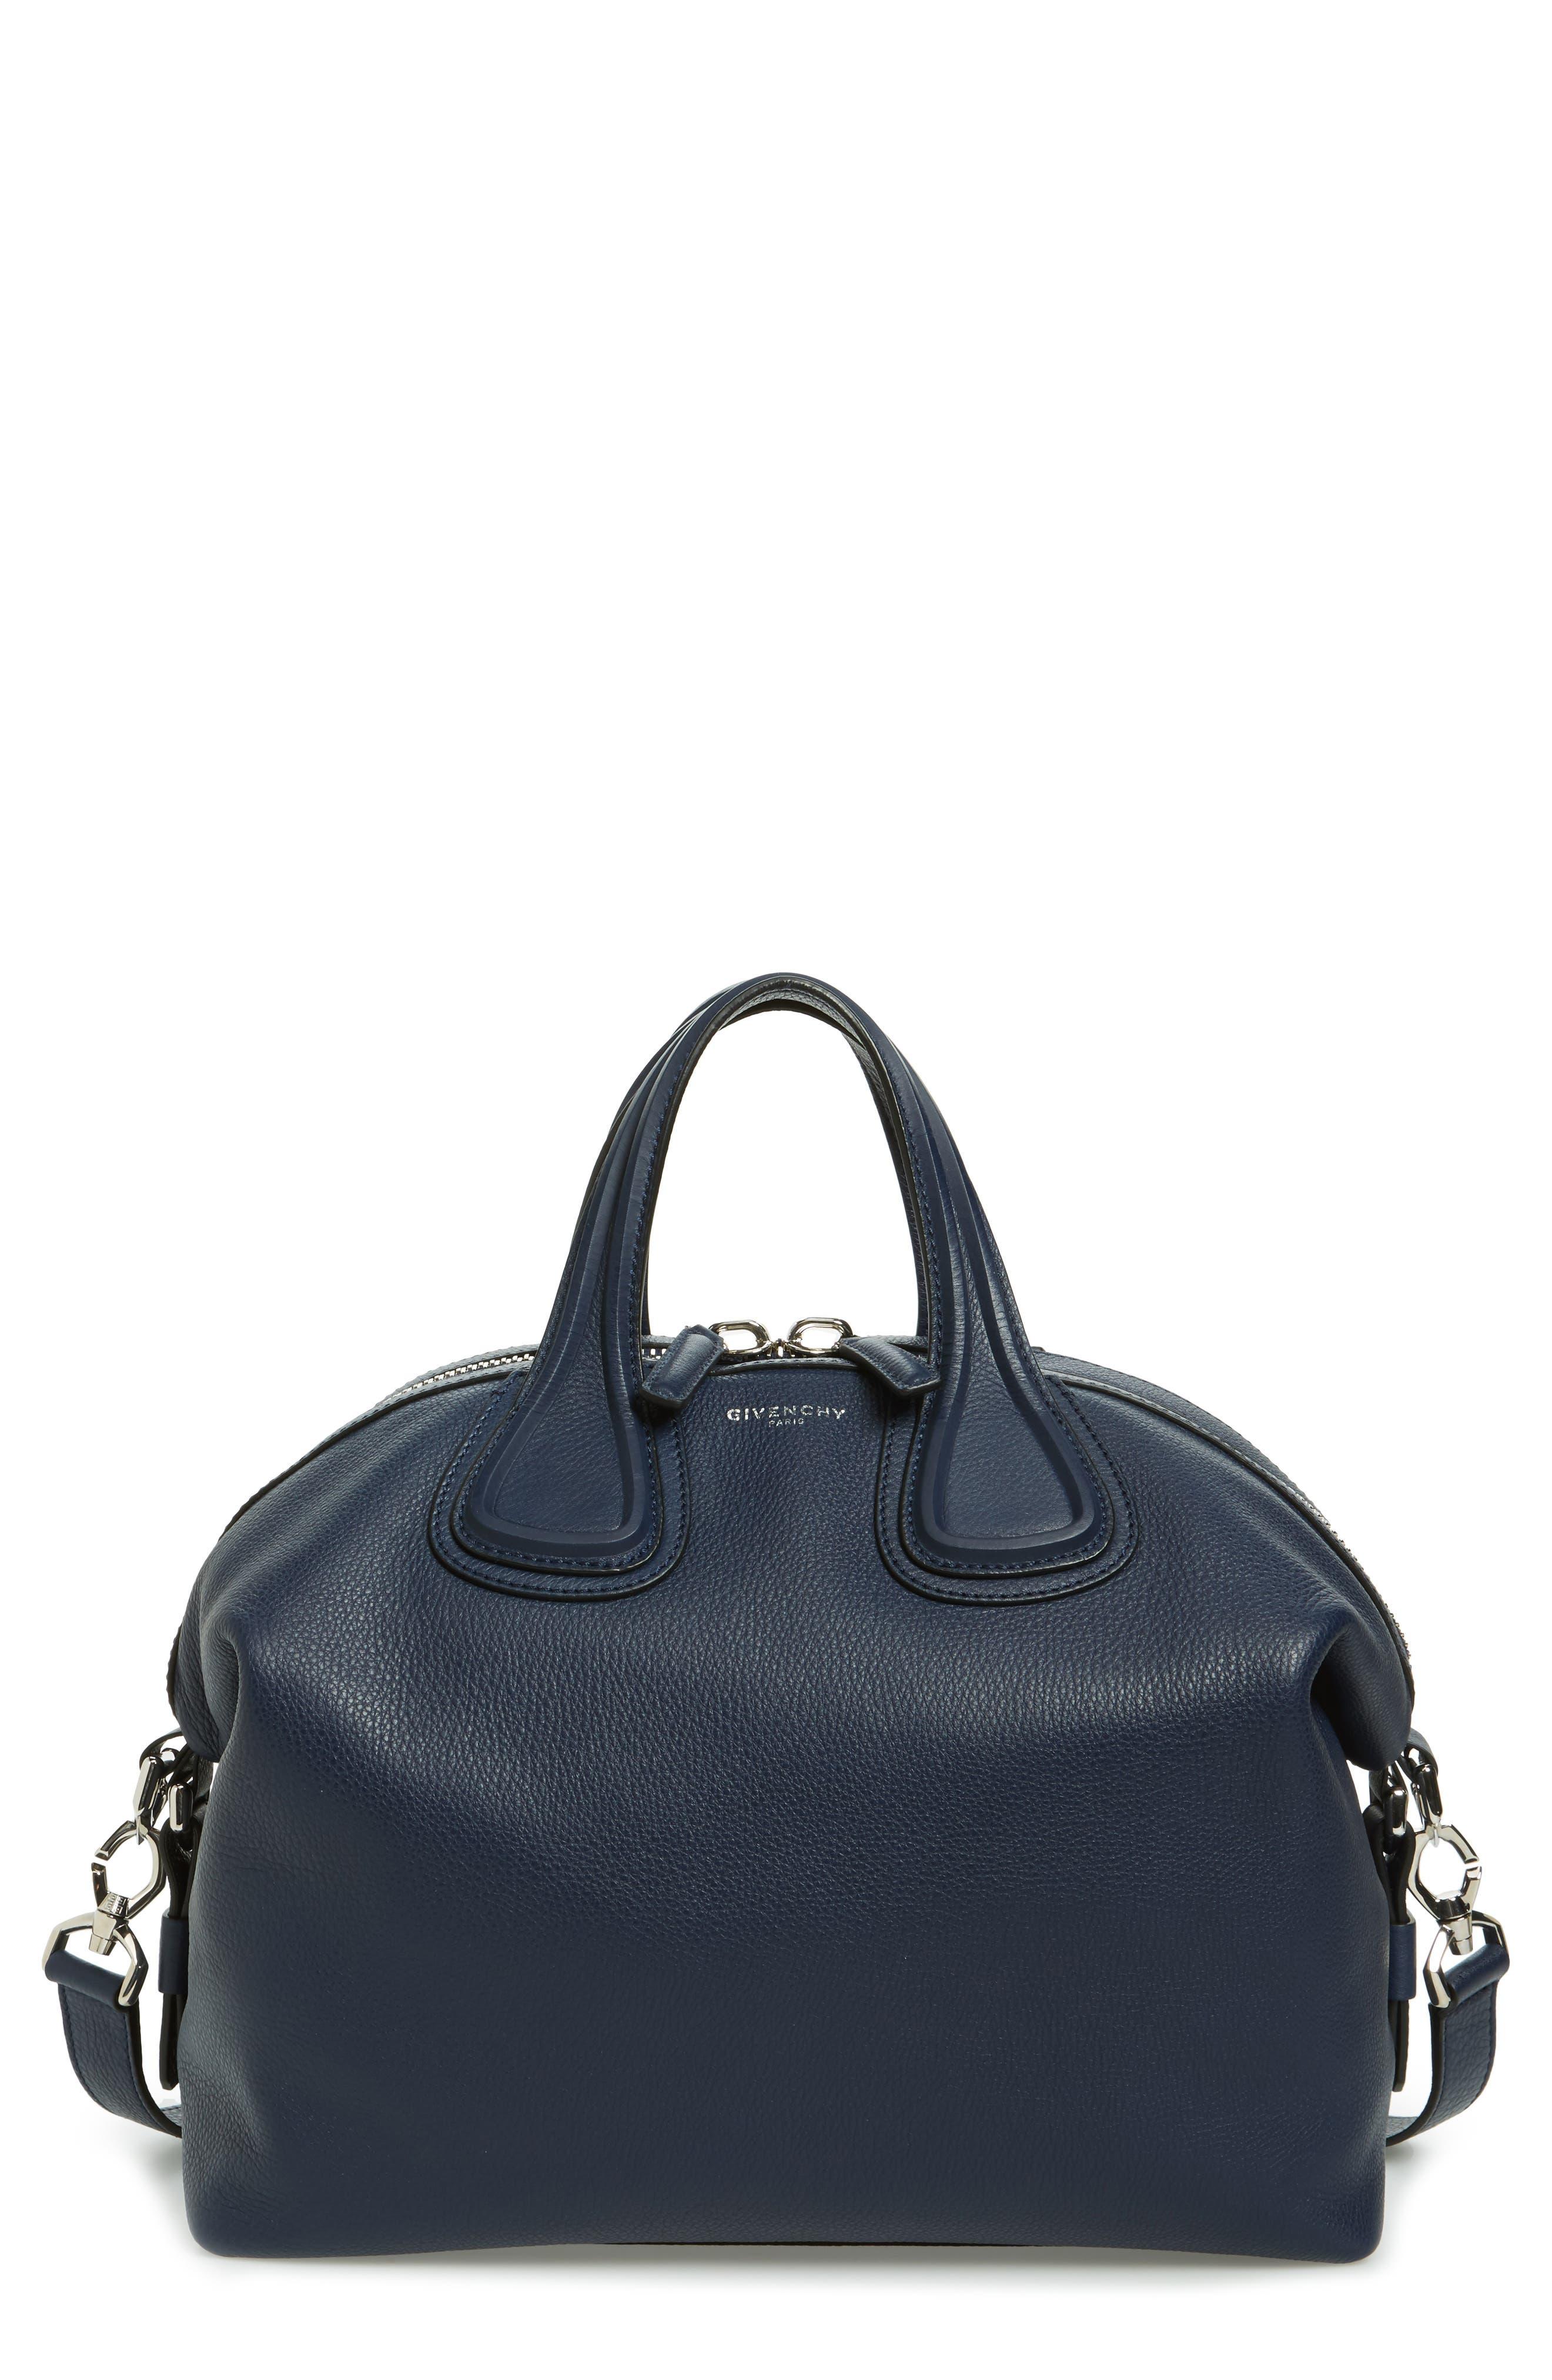 Alternate Image 1 Selected - Givenchy 'Medium Nightingale' Calfskin Leather Satchel